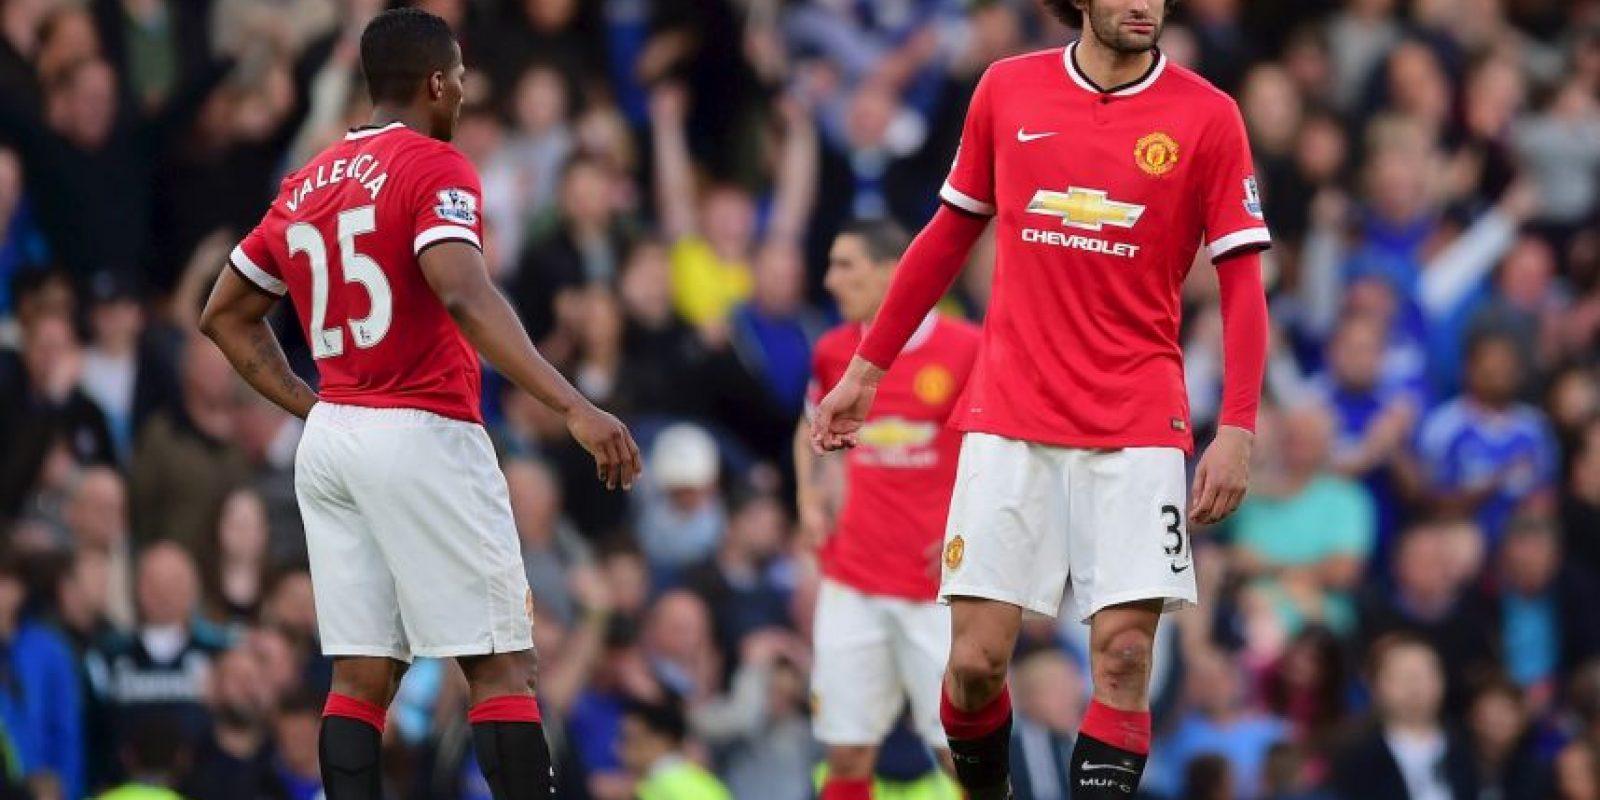 En 2013, llegó a Manchester United por 32 millones de euros. Foto:Getty Images